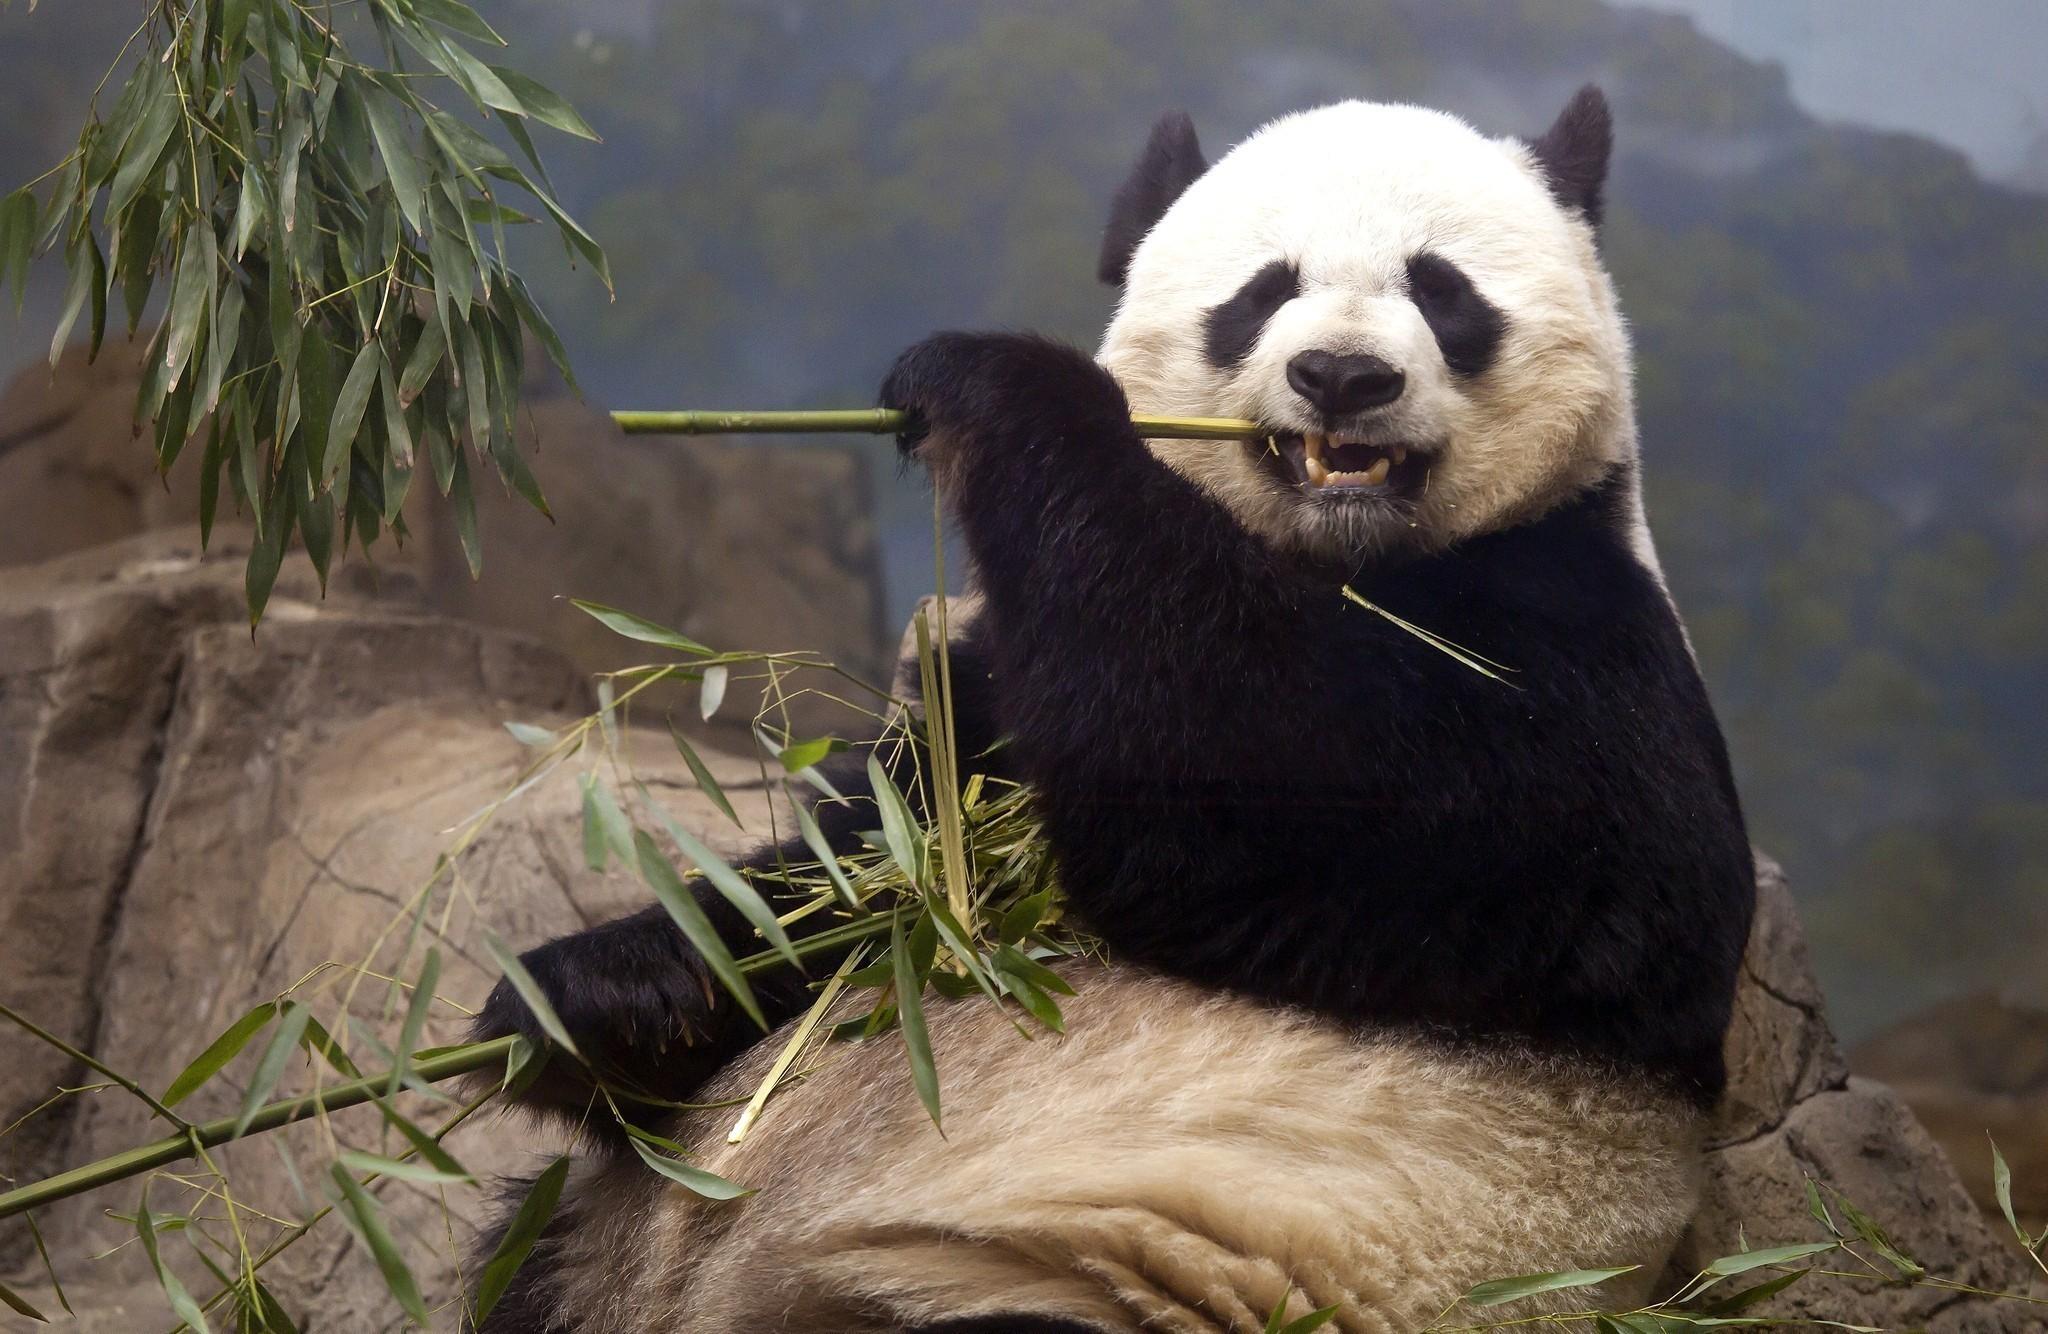 tải ảnh nền gấu trúc panda